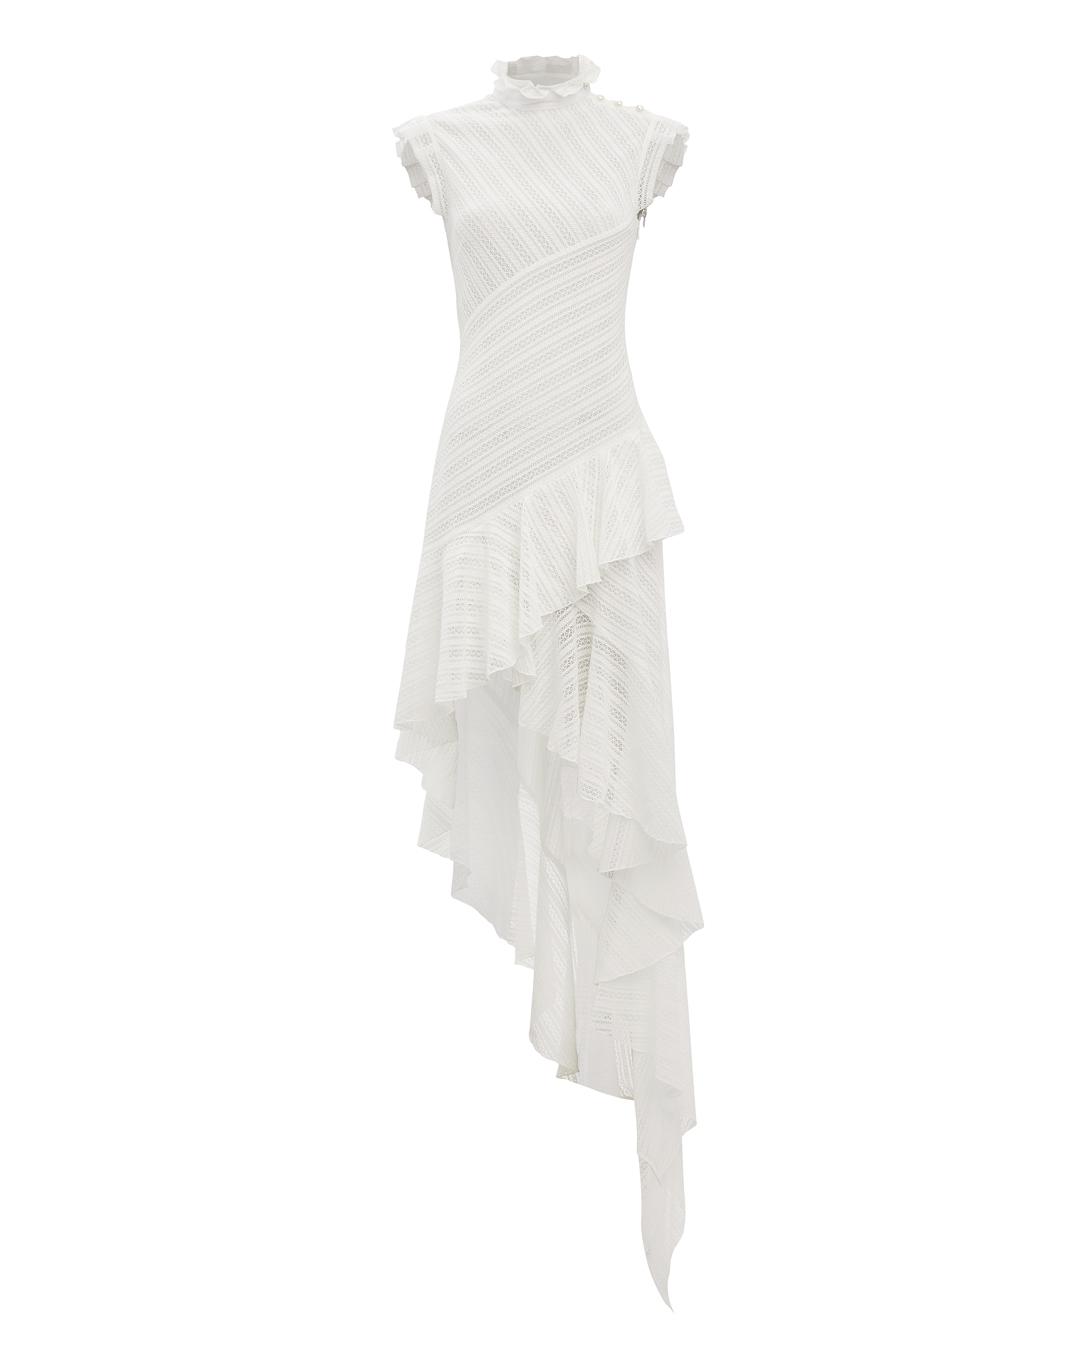 PHILOSOPHY DI L.SERAFINI Eyelet High-Low Dress